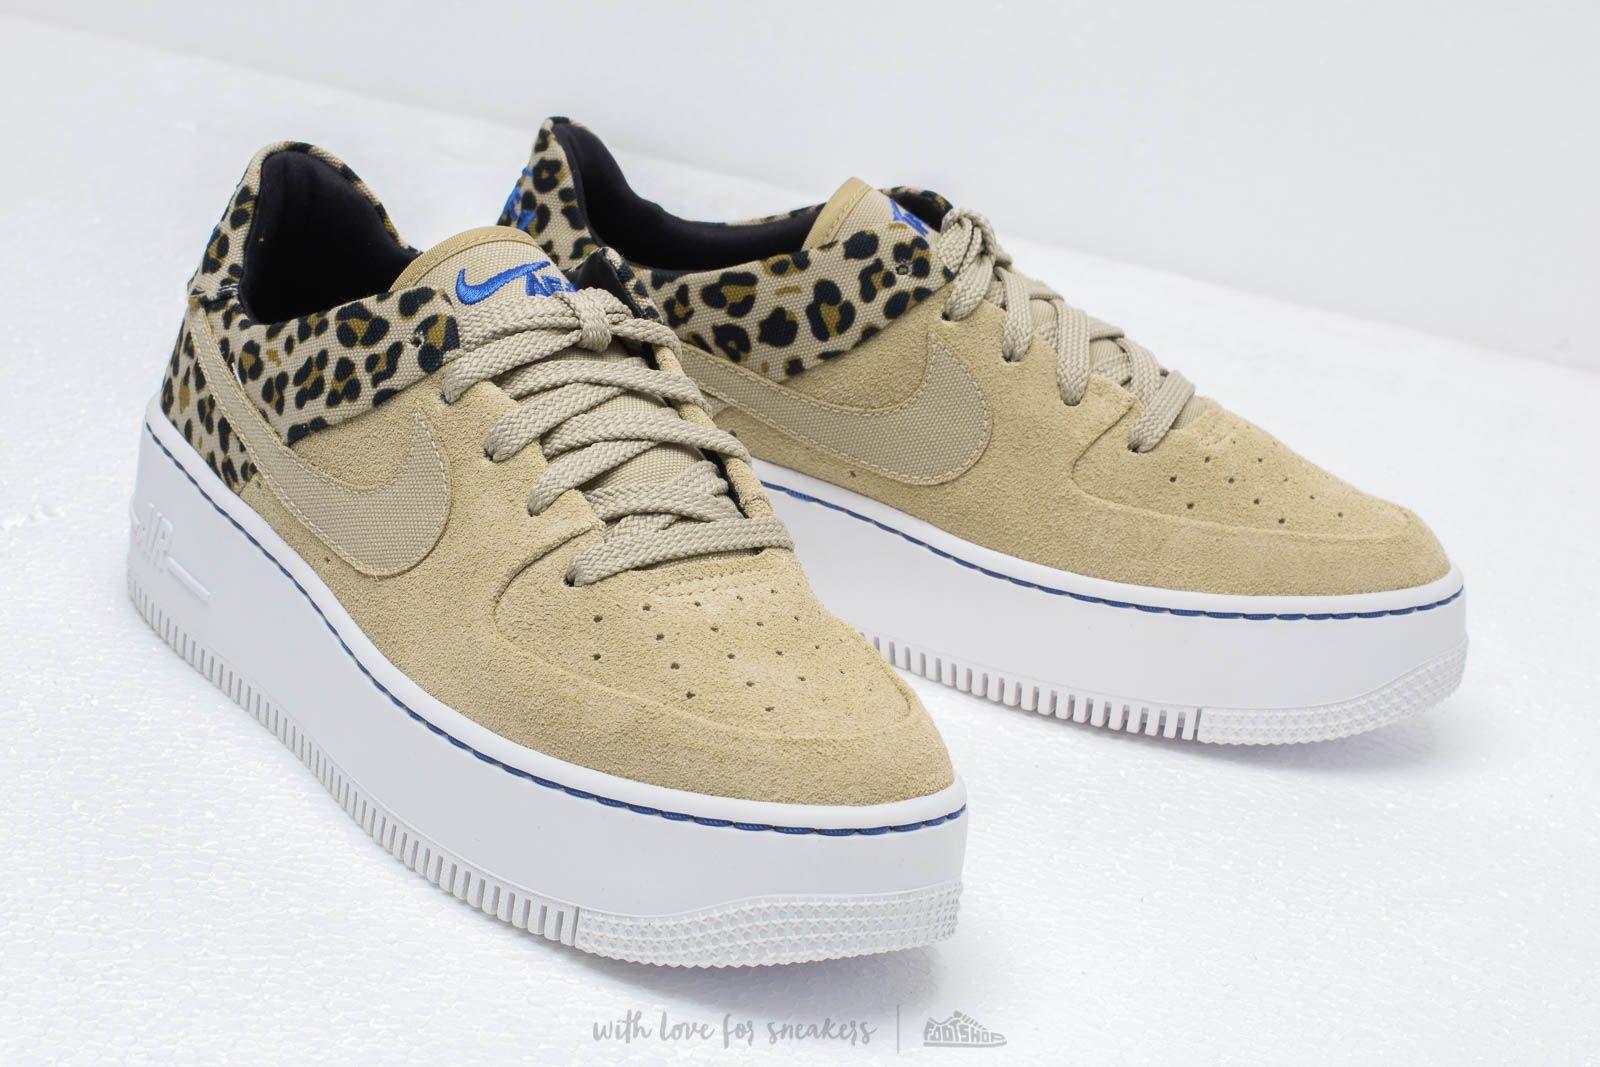 Nike W Air Force 1 Sage Low Premium Desert Ore Racer Blue Black Wheat | Footshop